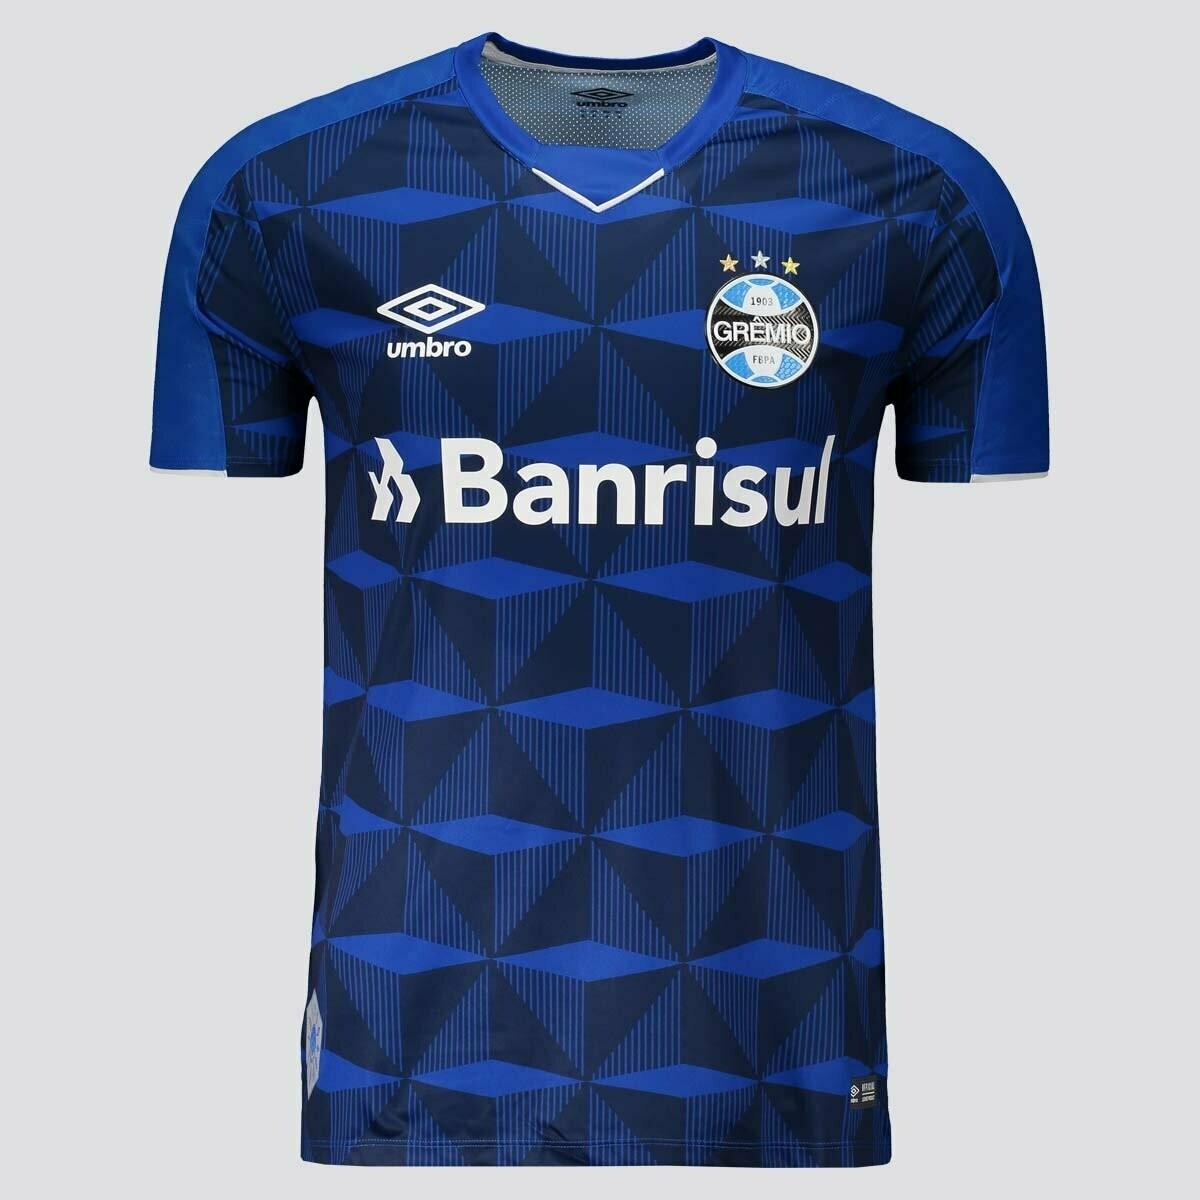 Camisa Umbro Grêmio III 2019